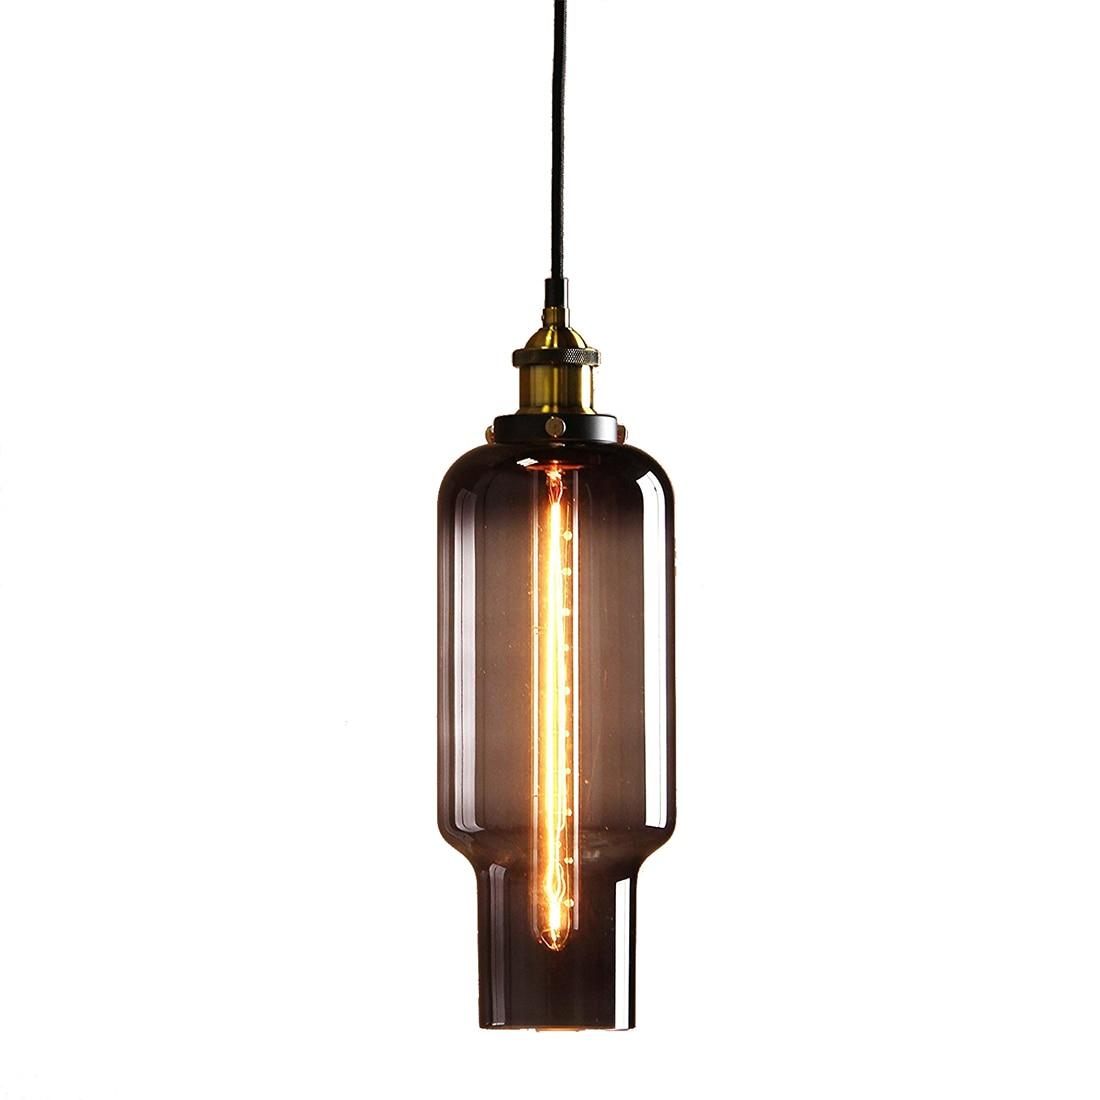 Vintage Industrial Metal Finish Black Gray Glass Shade Loft Pendant Lamp Retro Ceiling  Vintage Light fitting